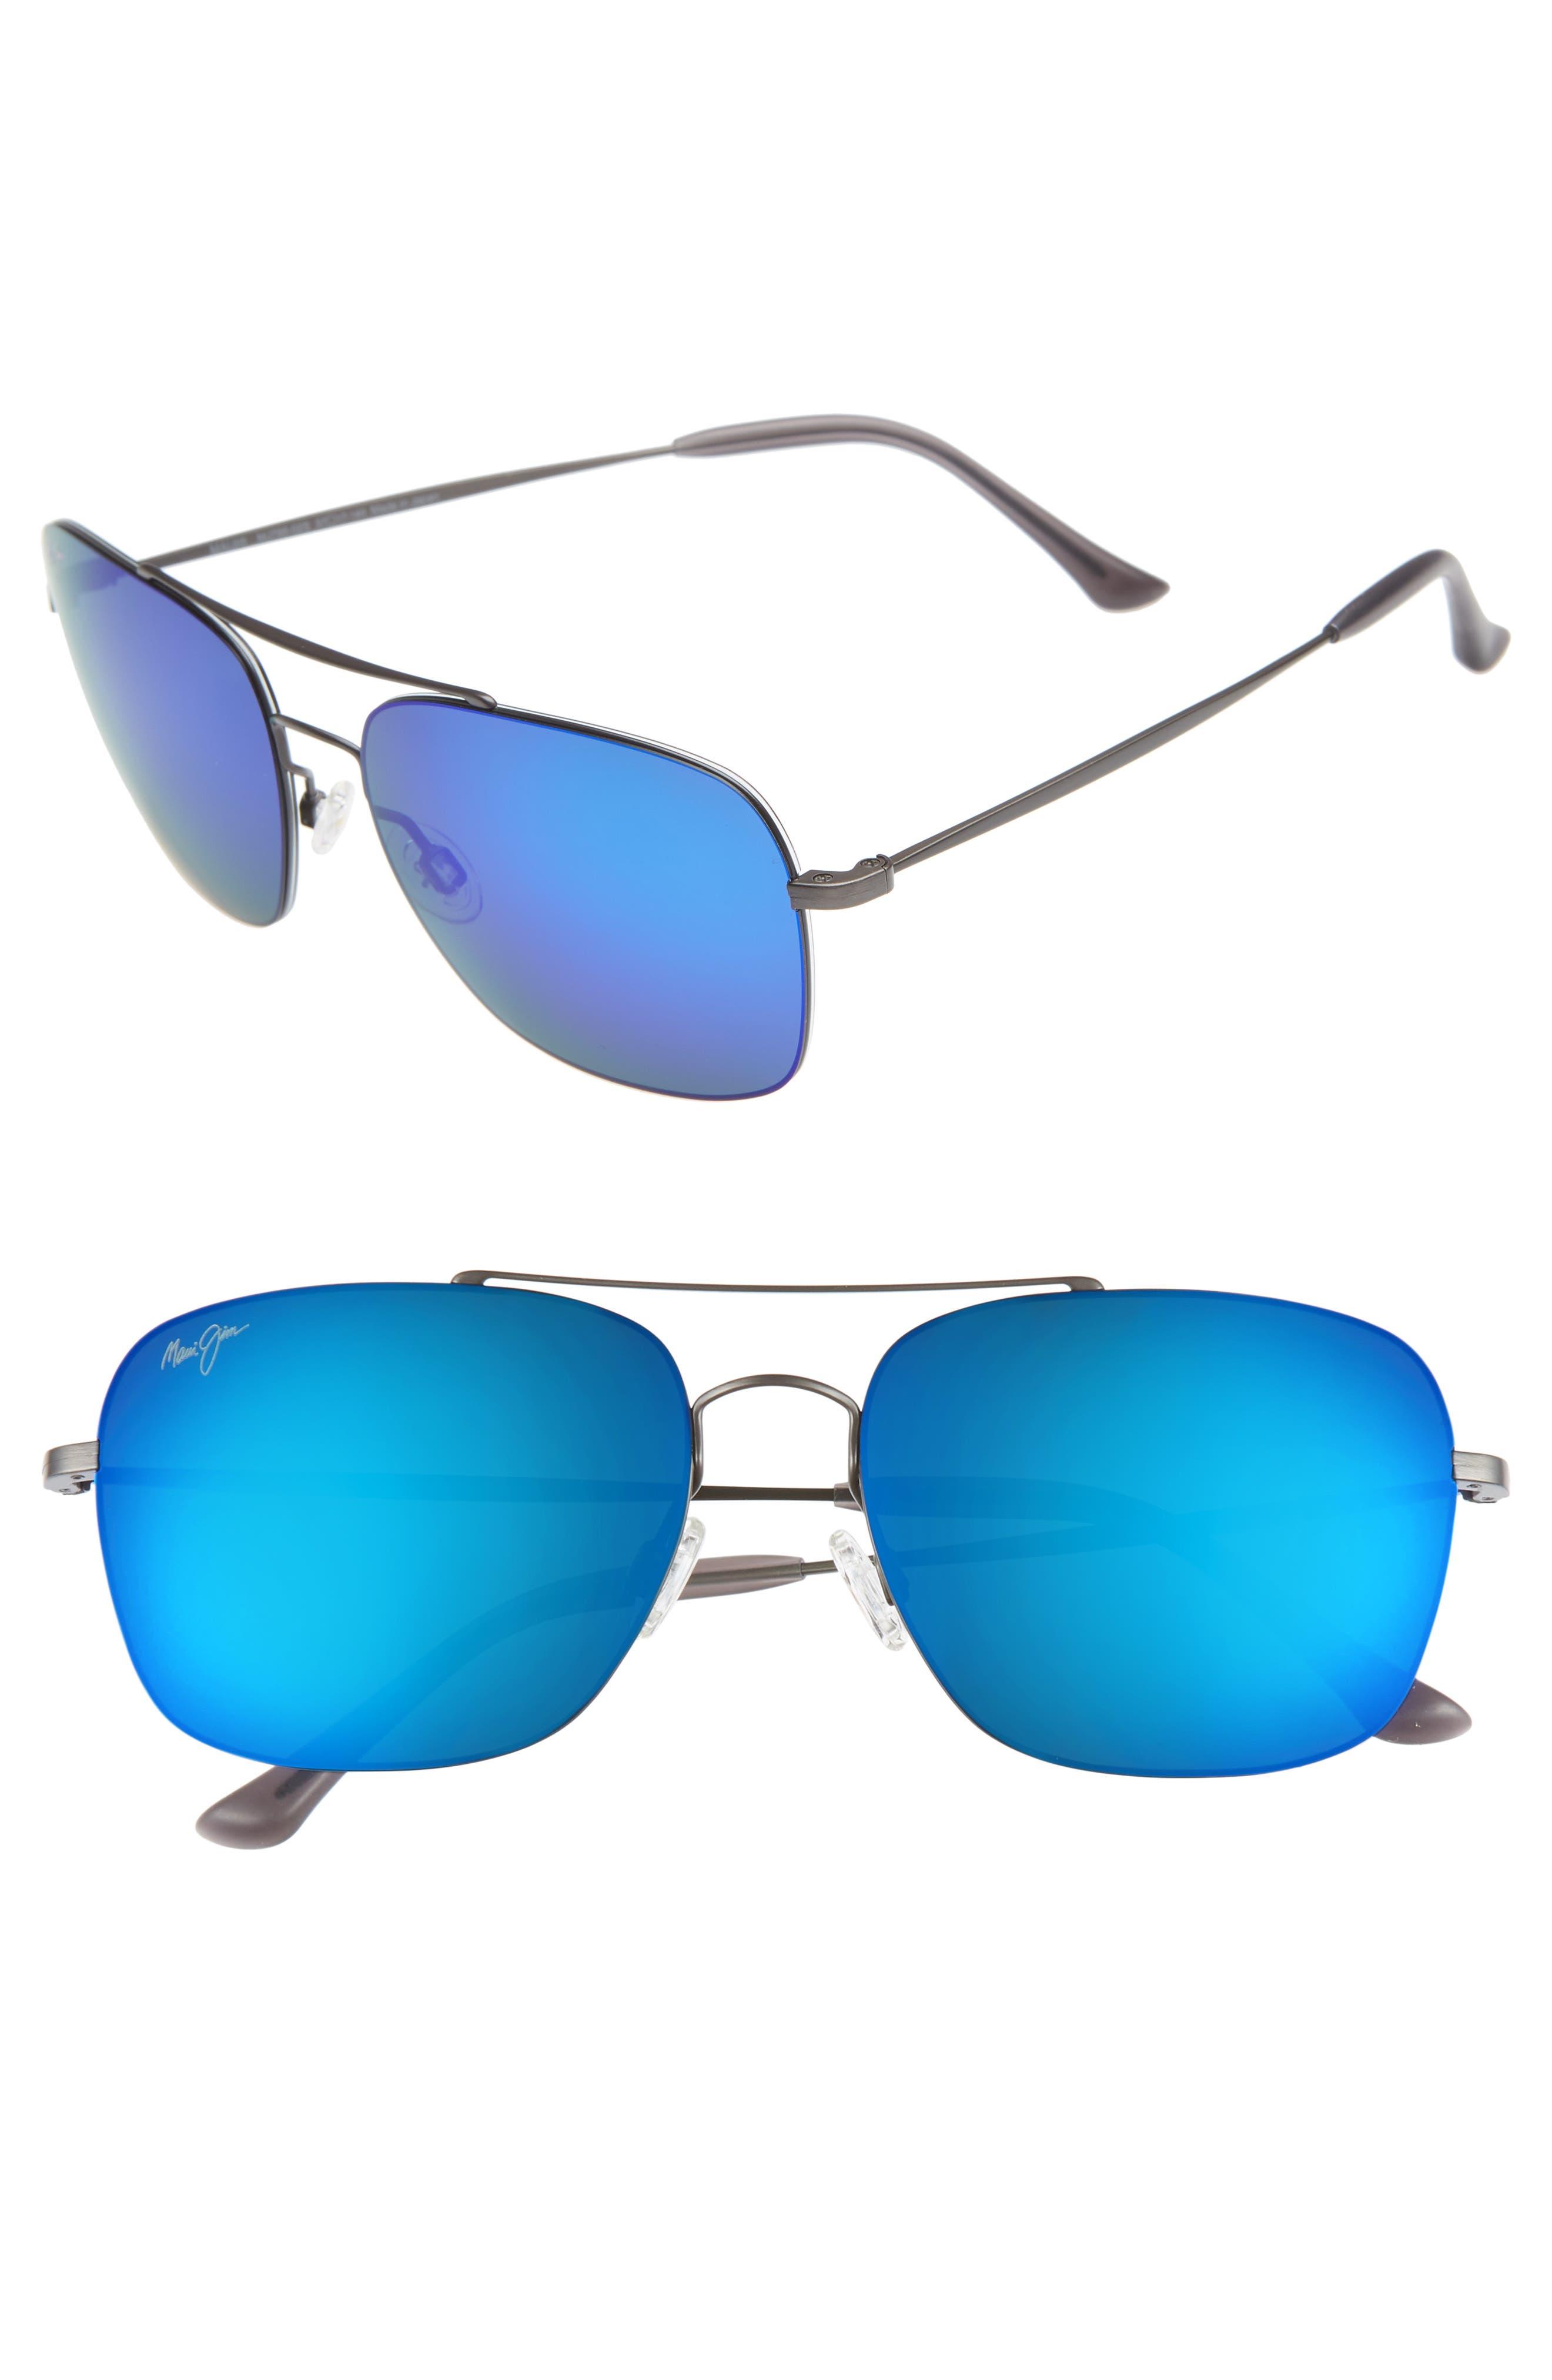 Maui Jim Lava Tube 57Mm Polarizedplus2 Aviator Sunglasses - Dark Gunmetal/blue Hawaii